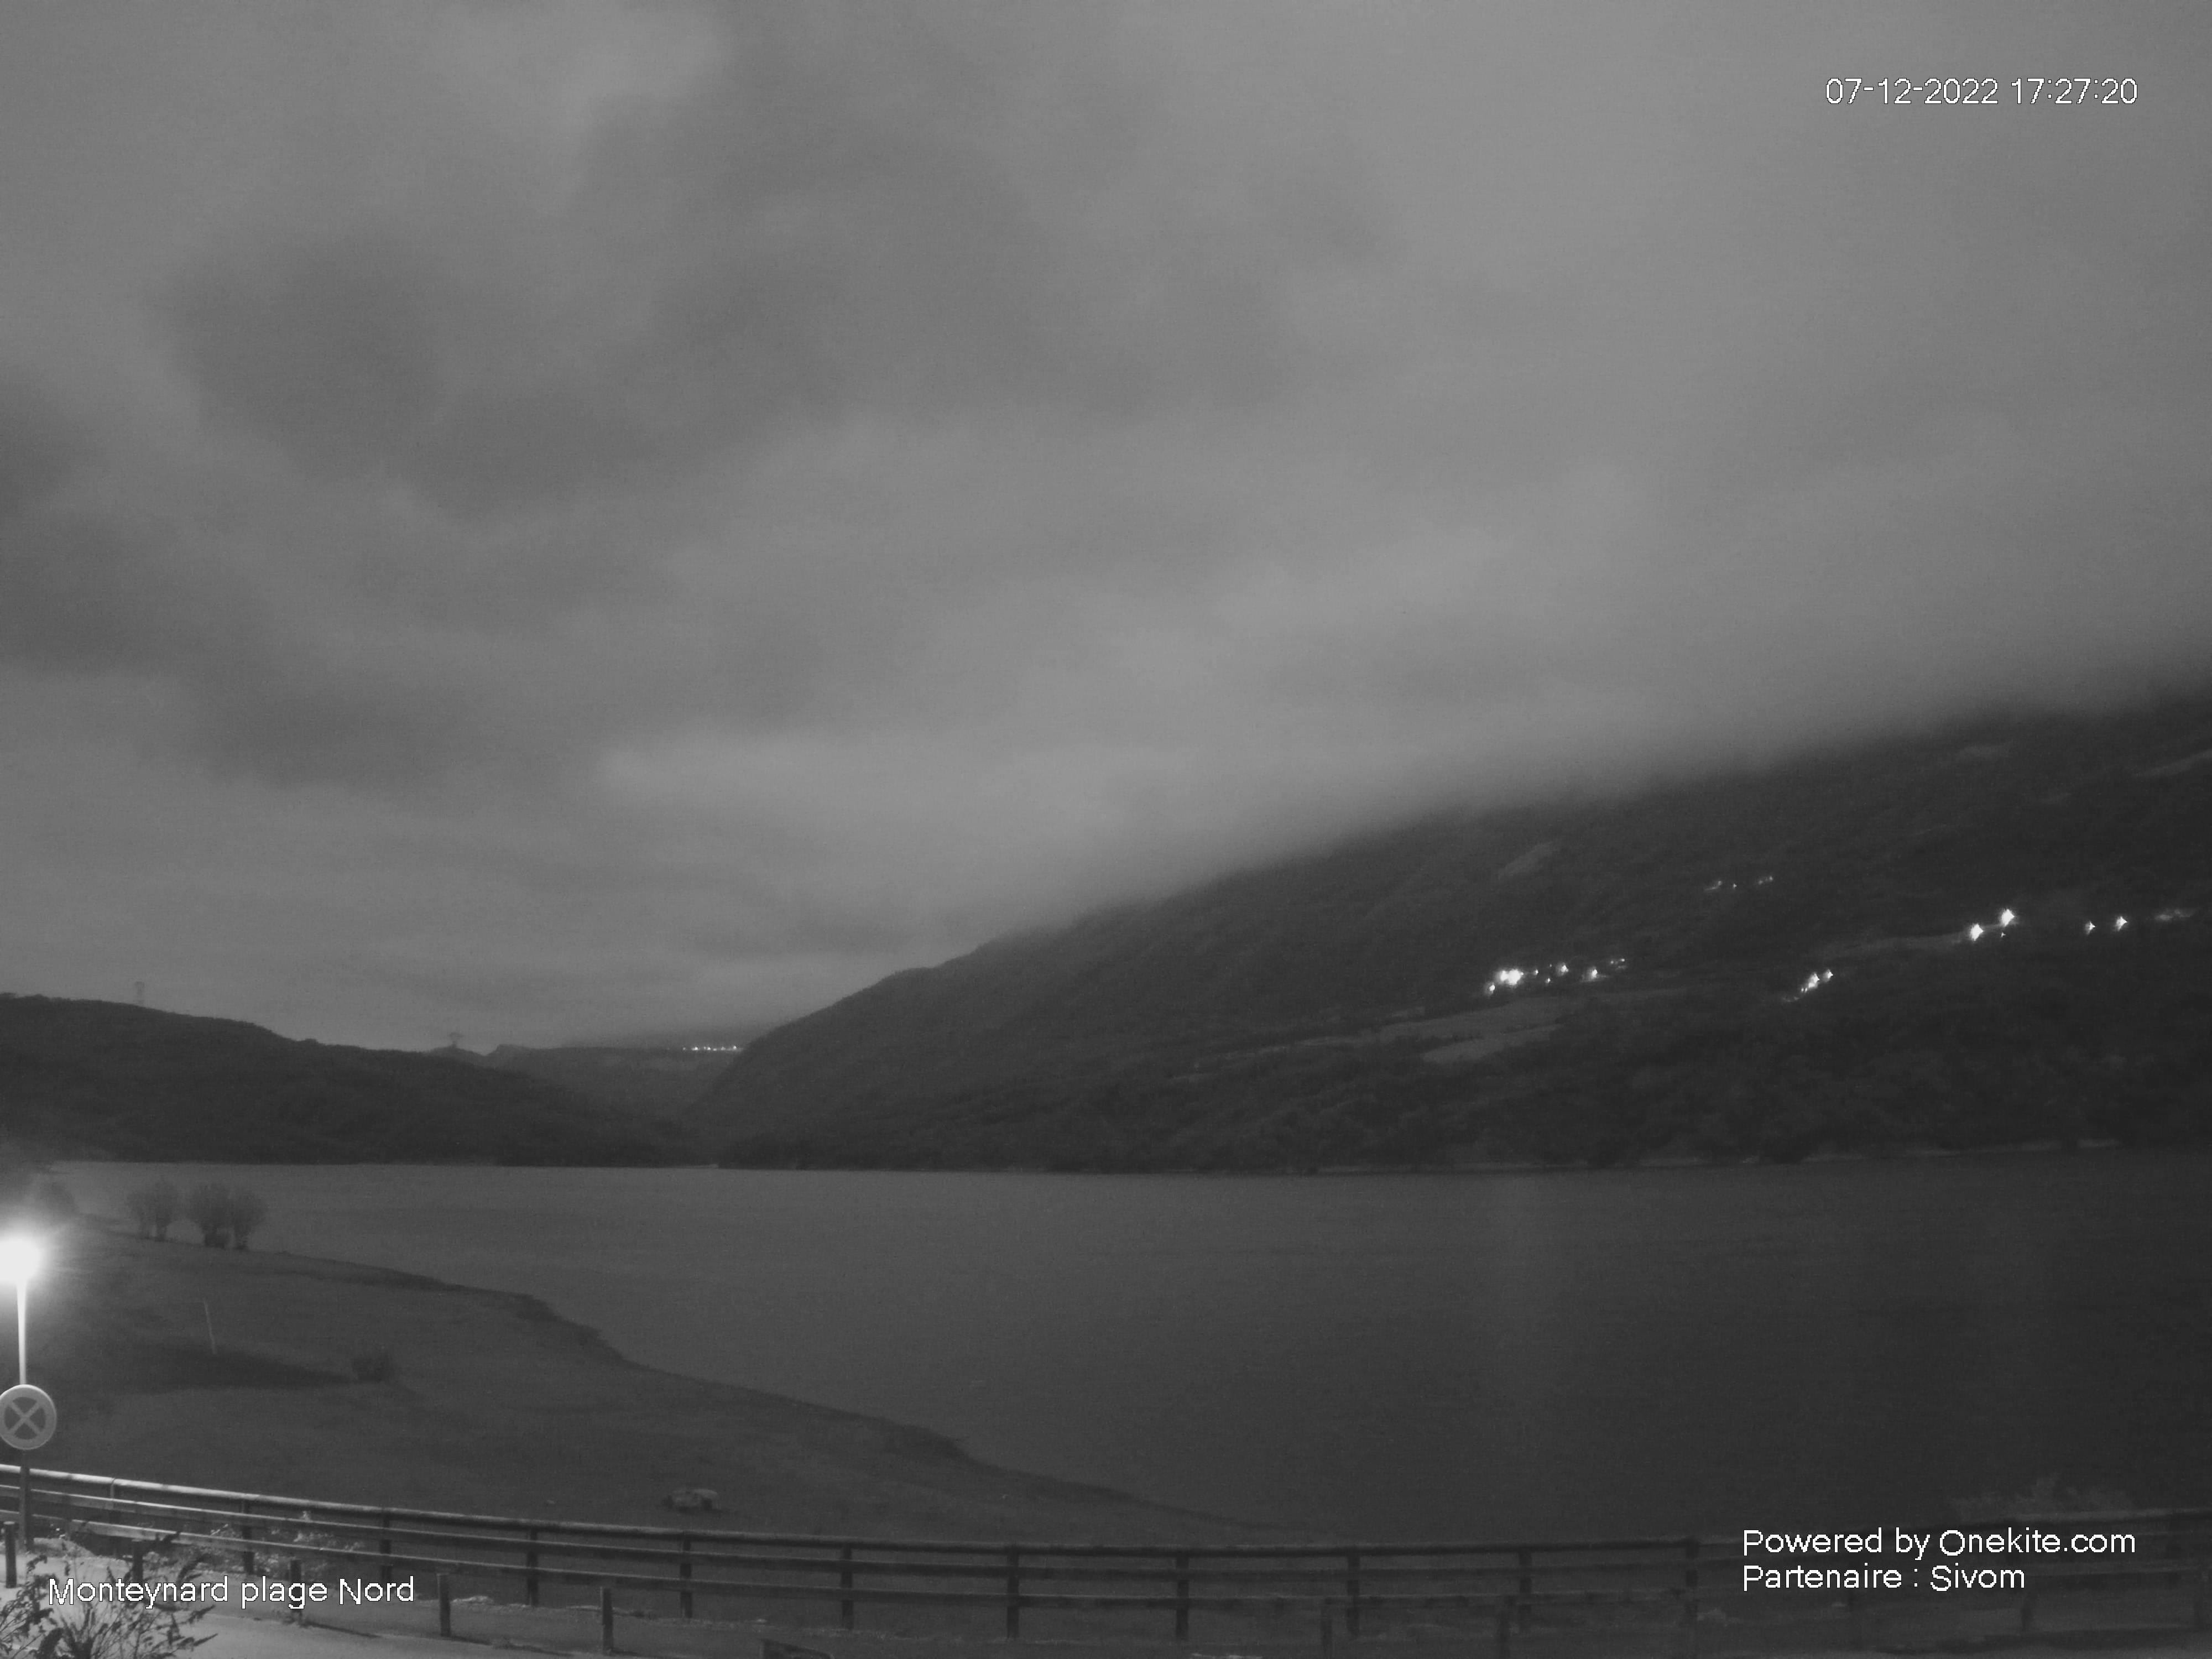 chargement-monteynard-webcam